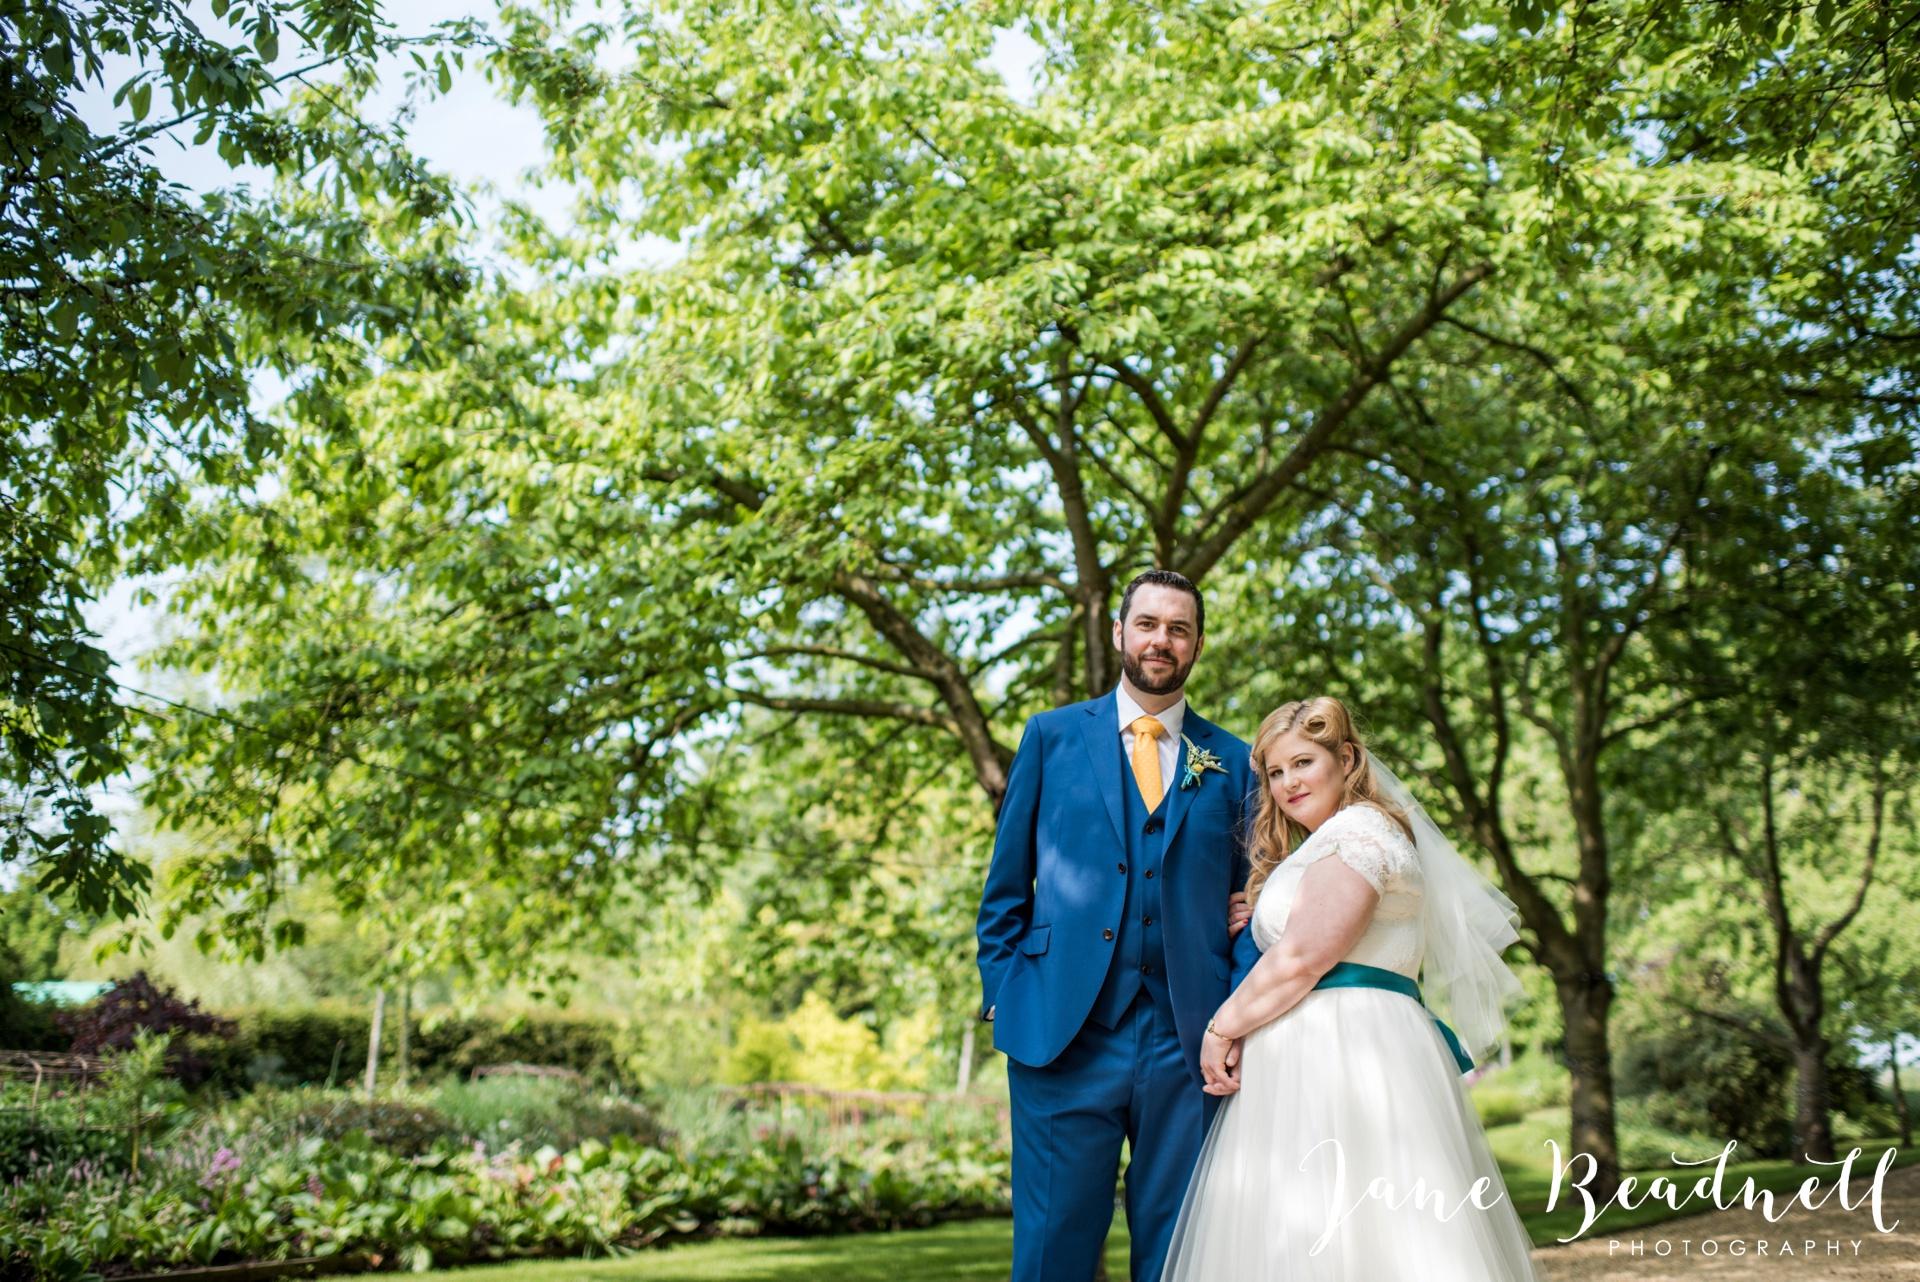 South Farm Wedding photography Hertfordshire by Jane Beadnell Photography fine art wedding photographer_0114